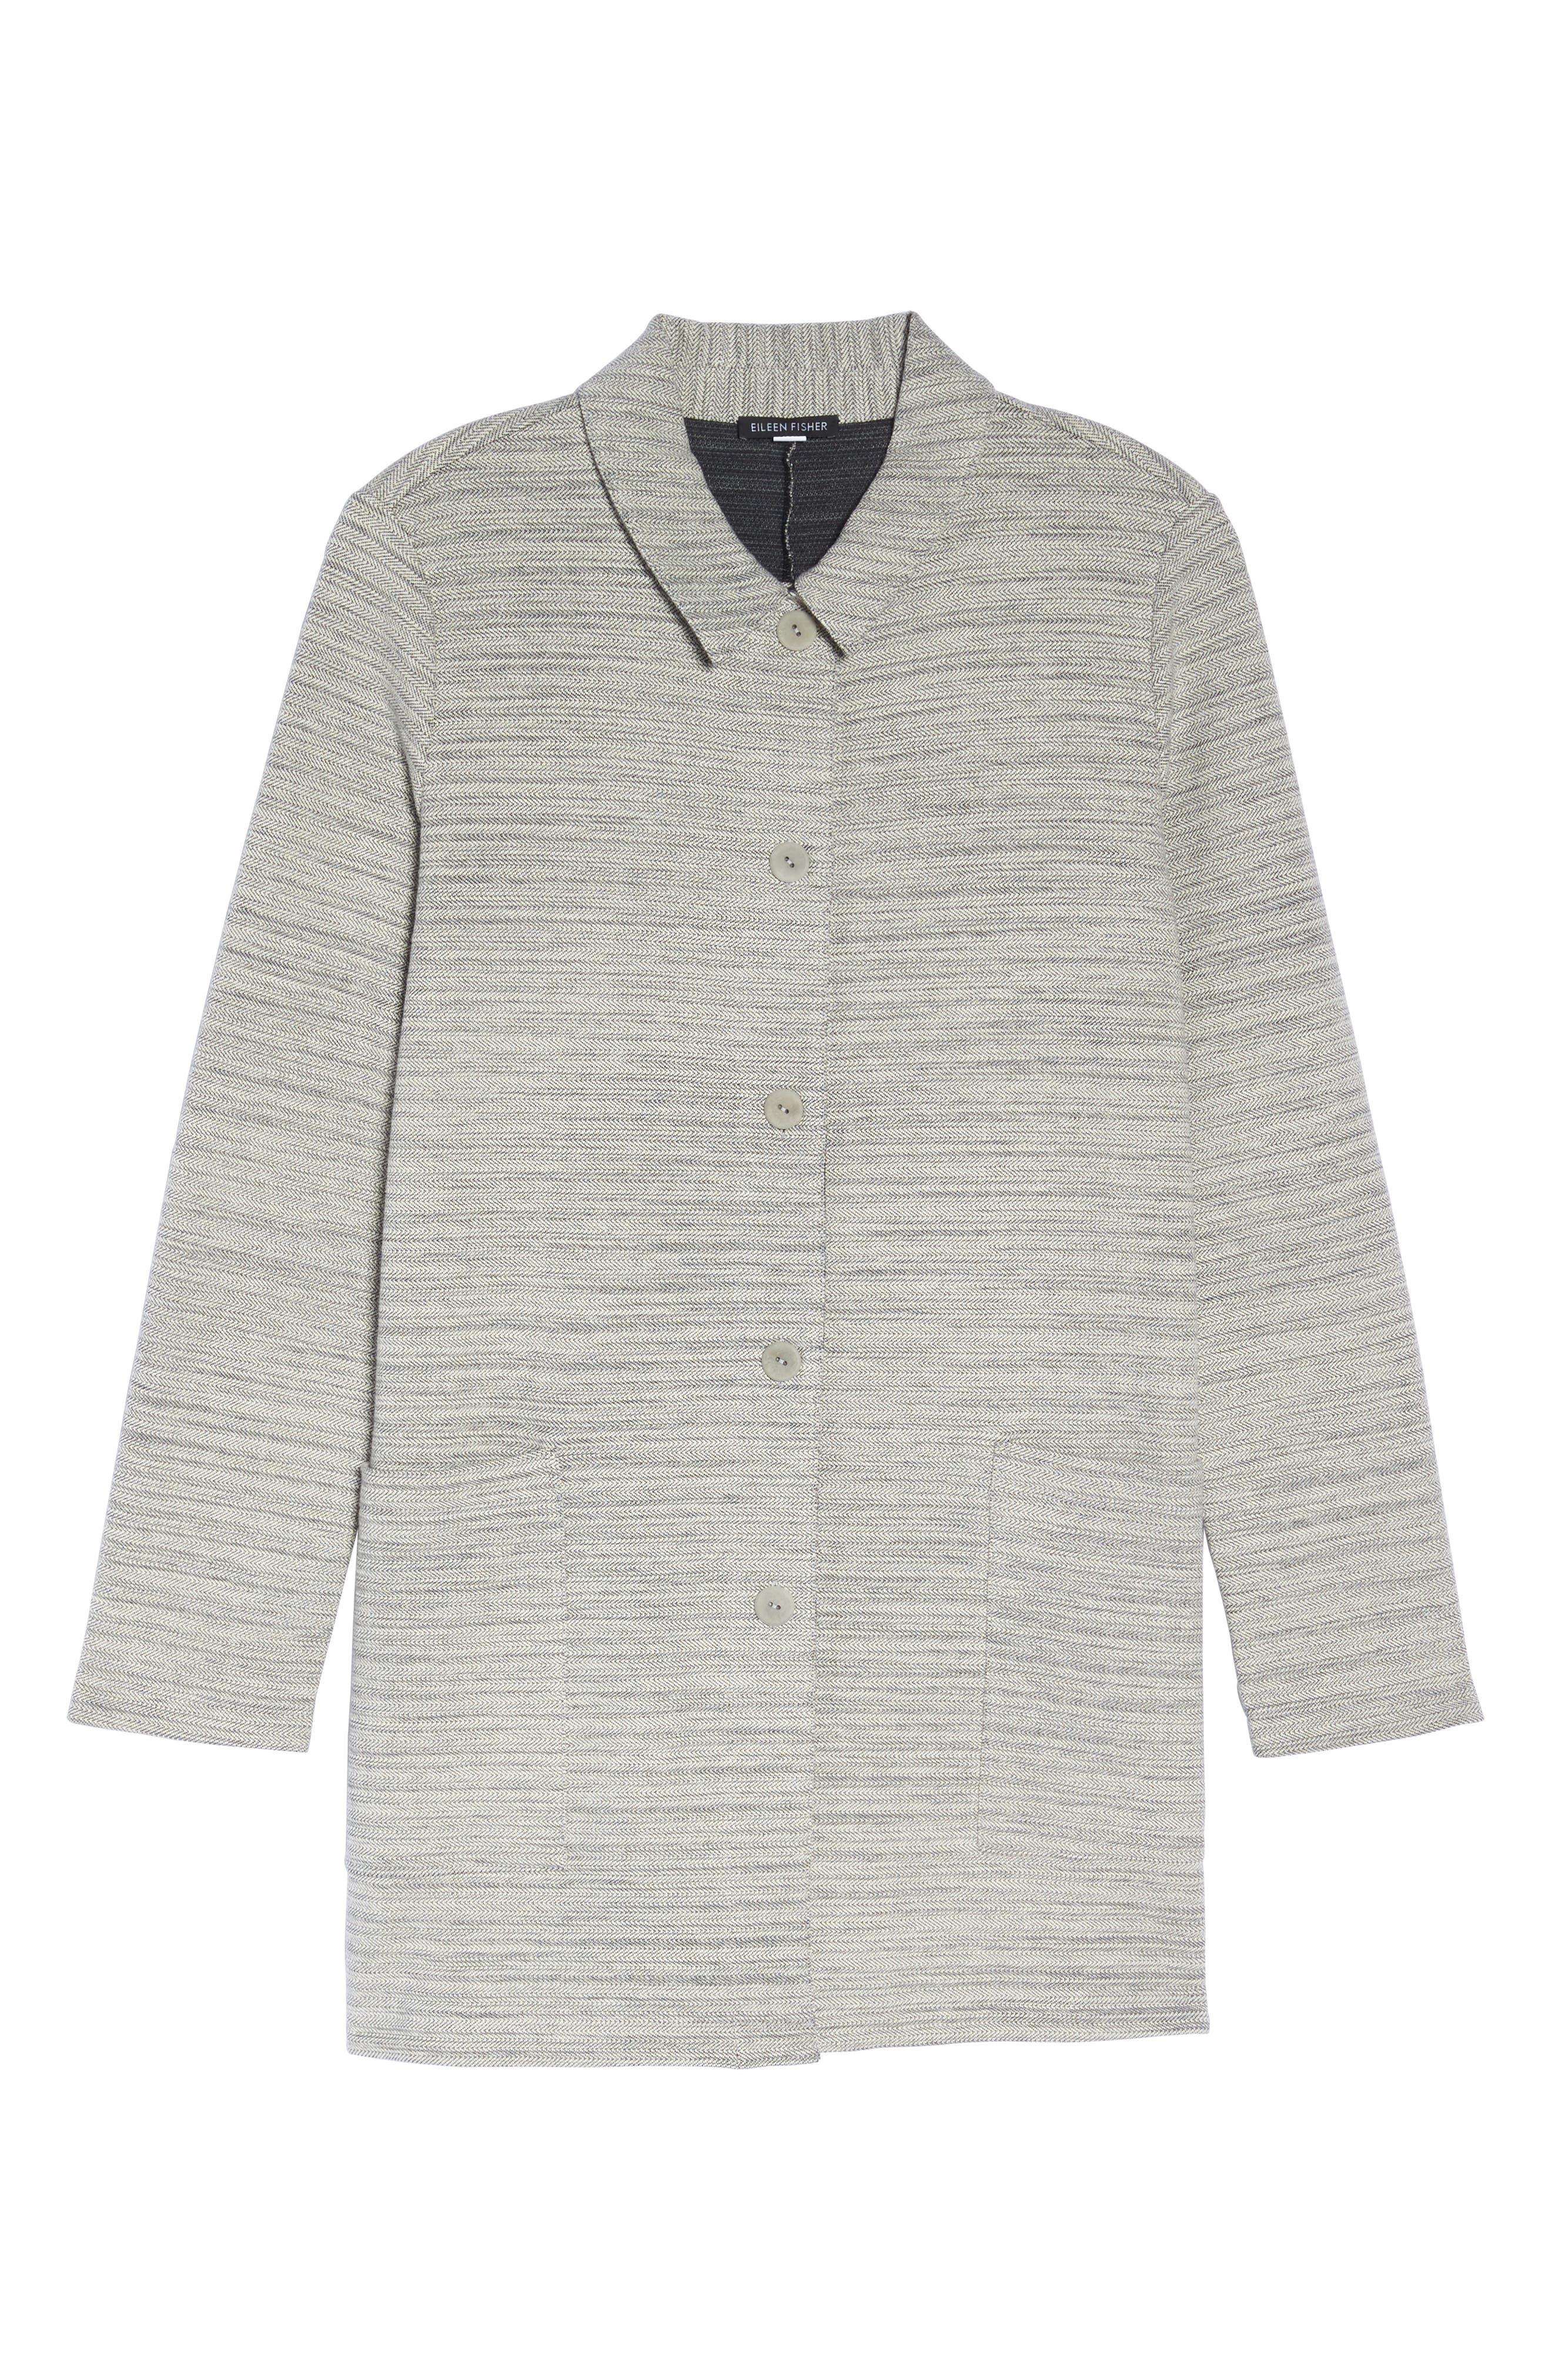 Cotton Blend Tweed Jacket,                             Alternate thumbnail 5, color,                             022